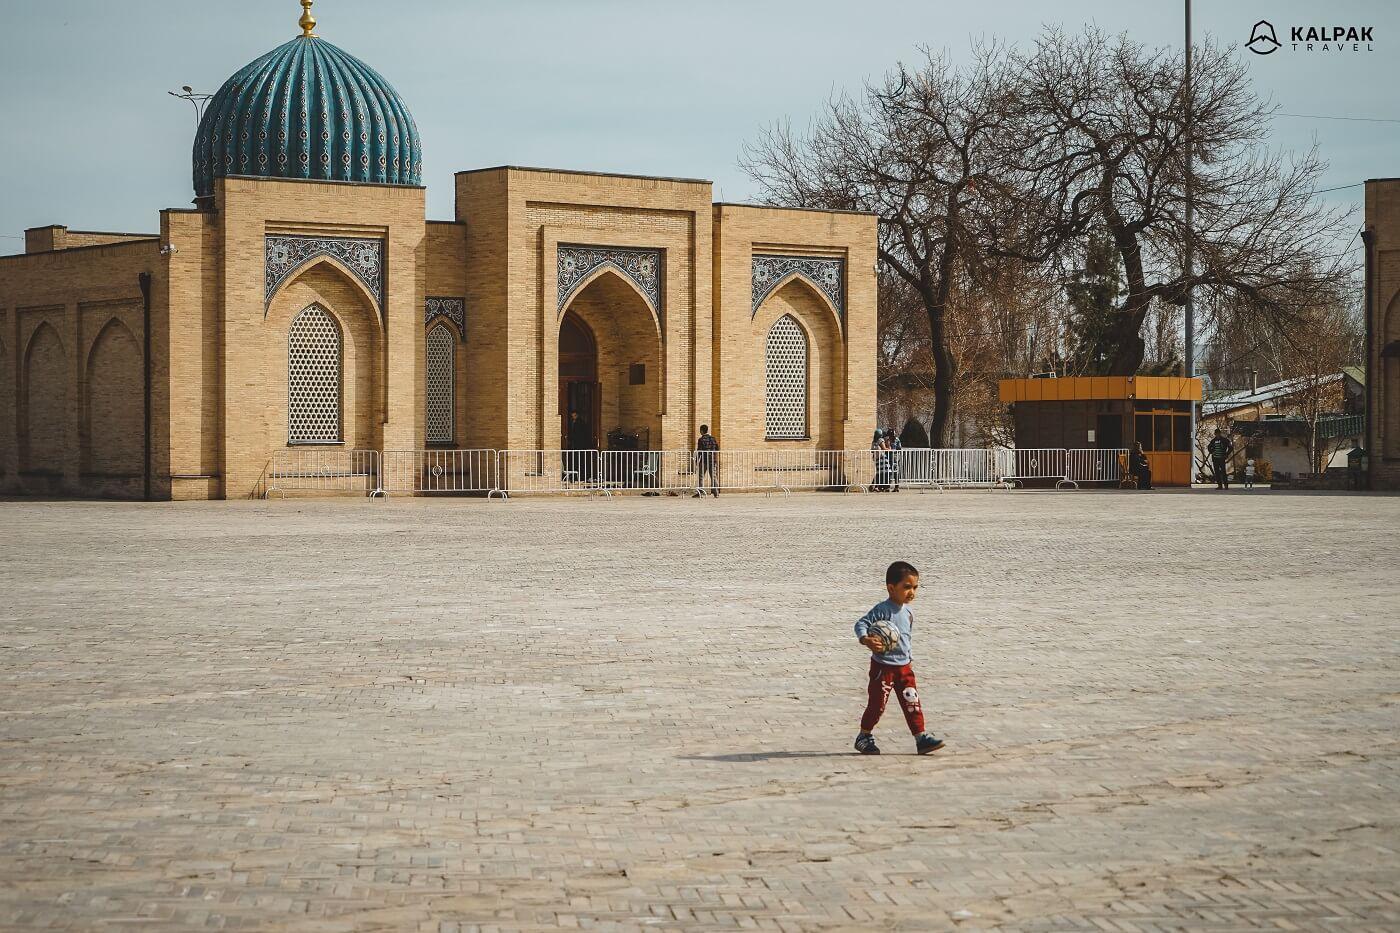 Tashkent Muy Muborak building with oldest Koran inside